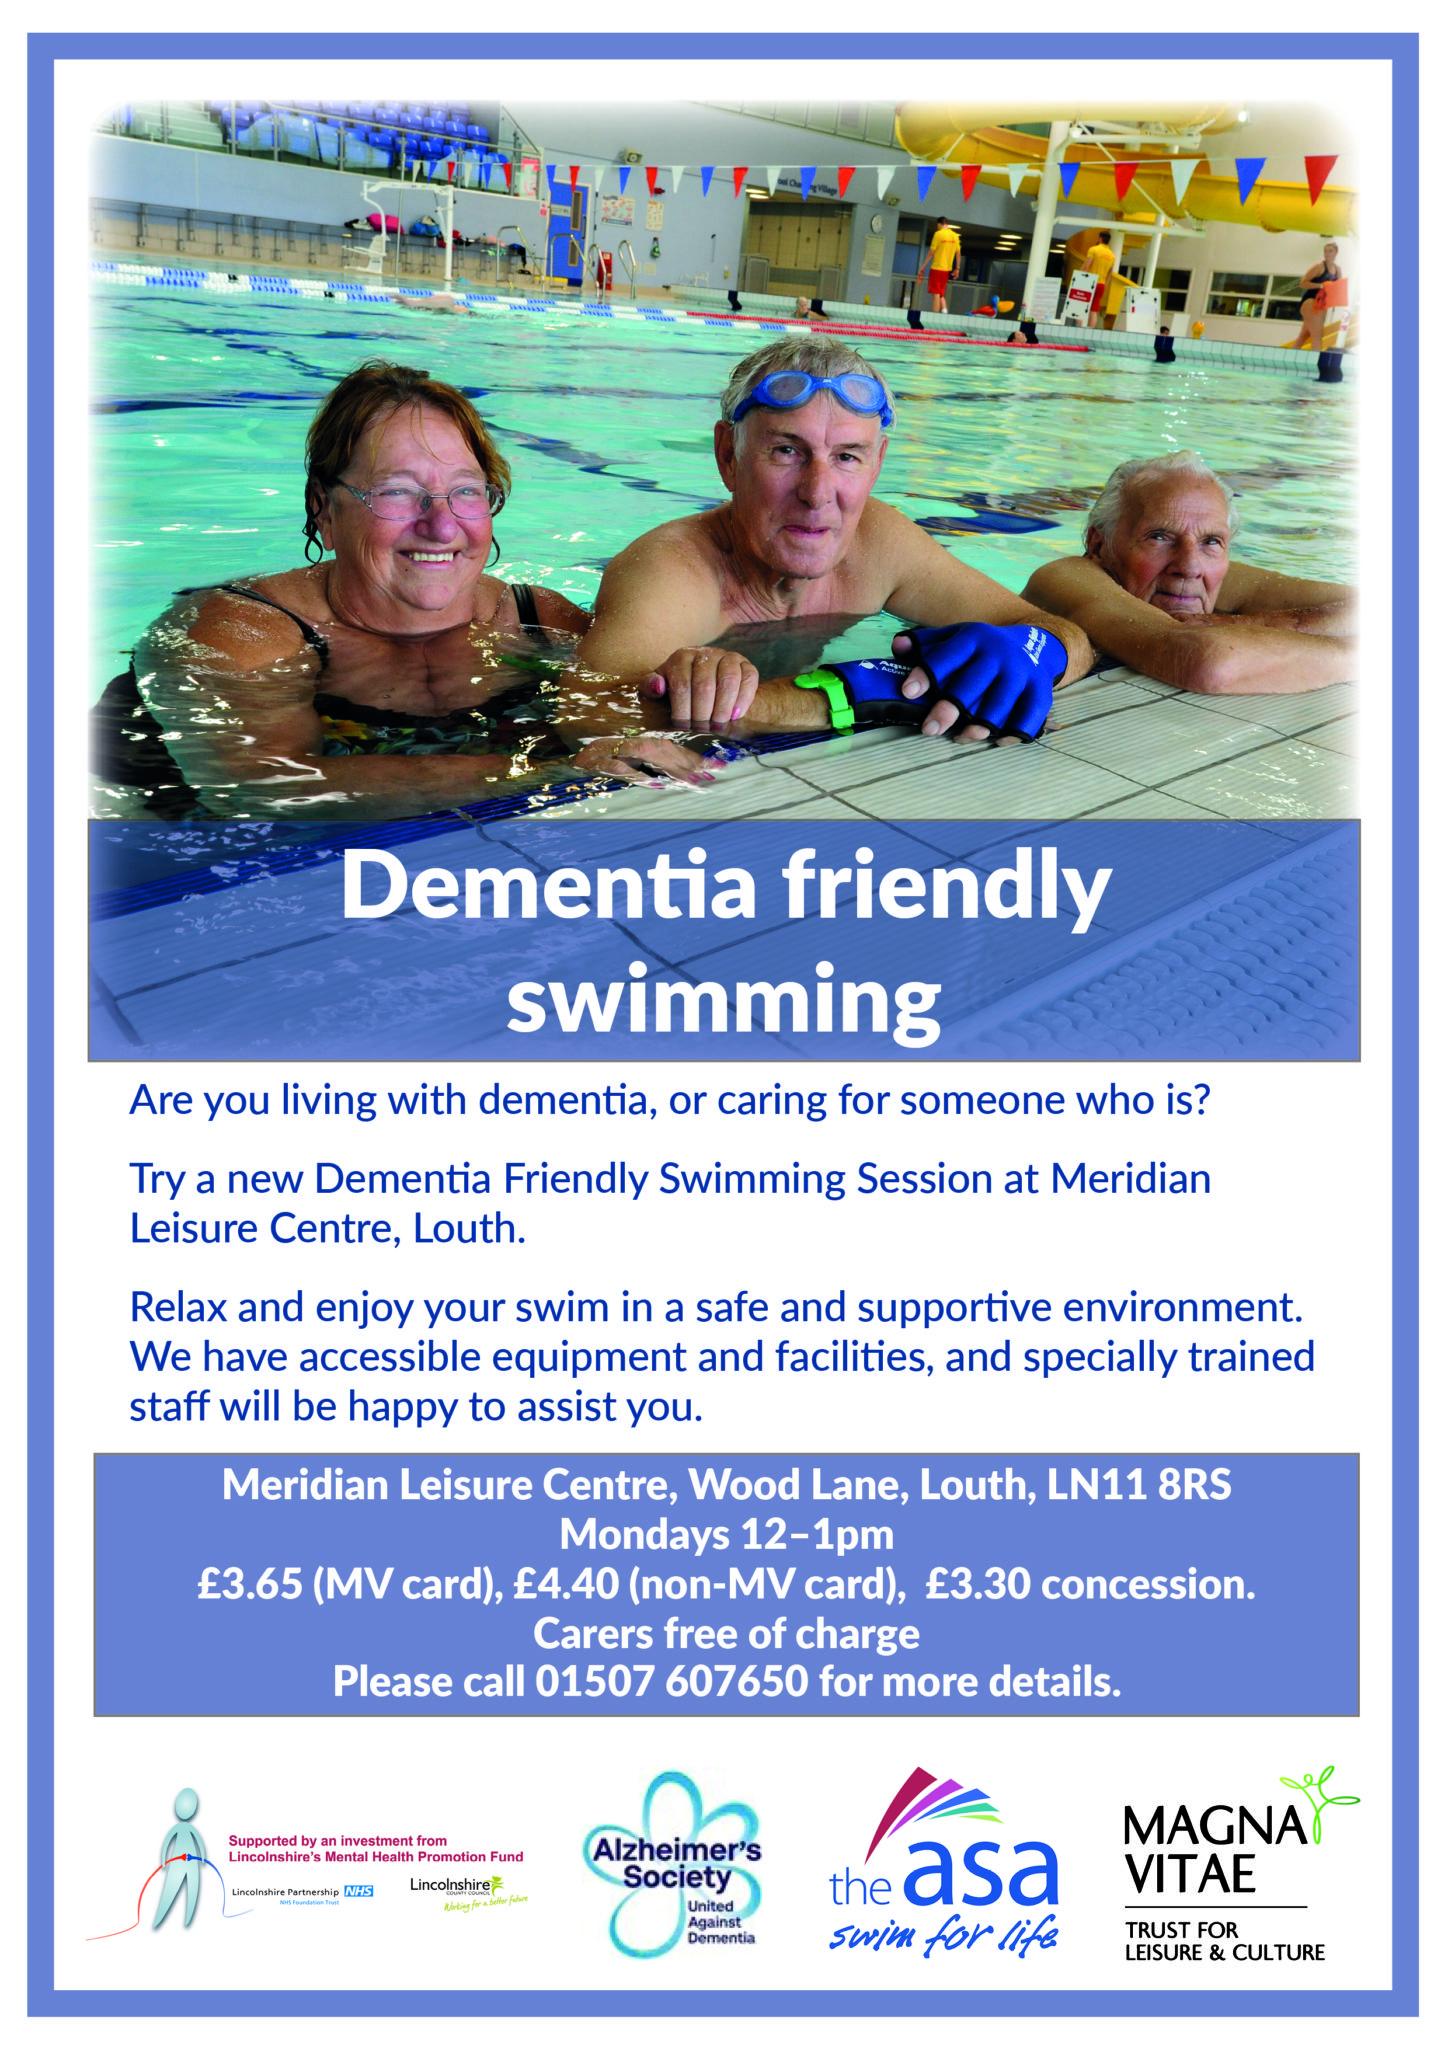 dementia friendly swimming poster